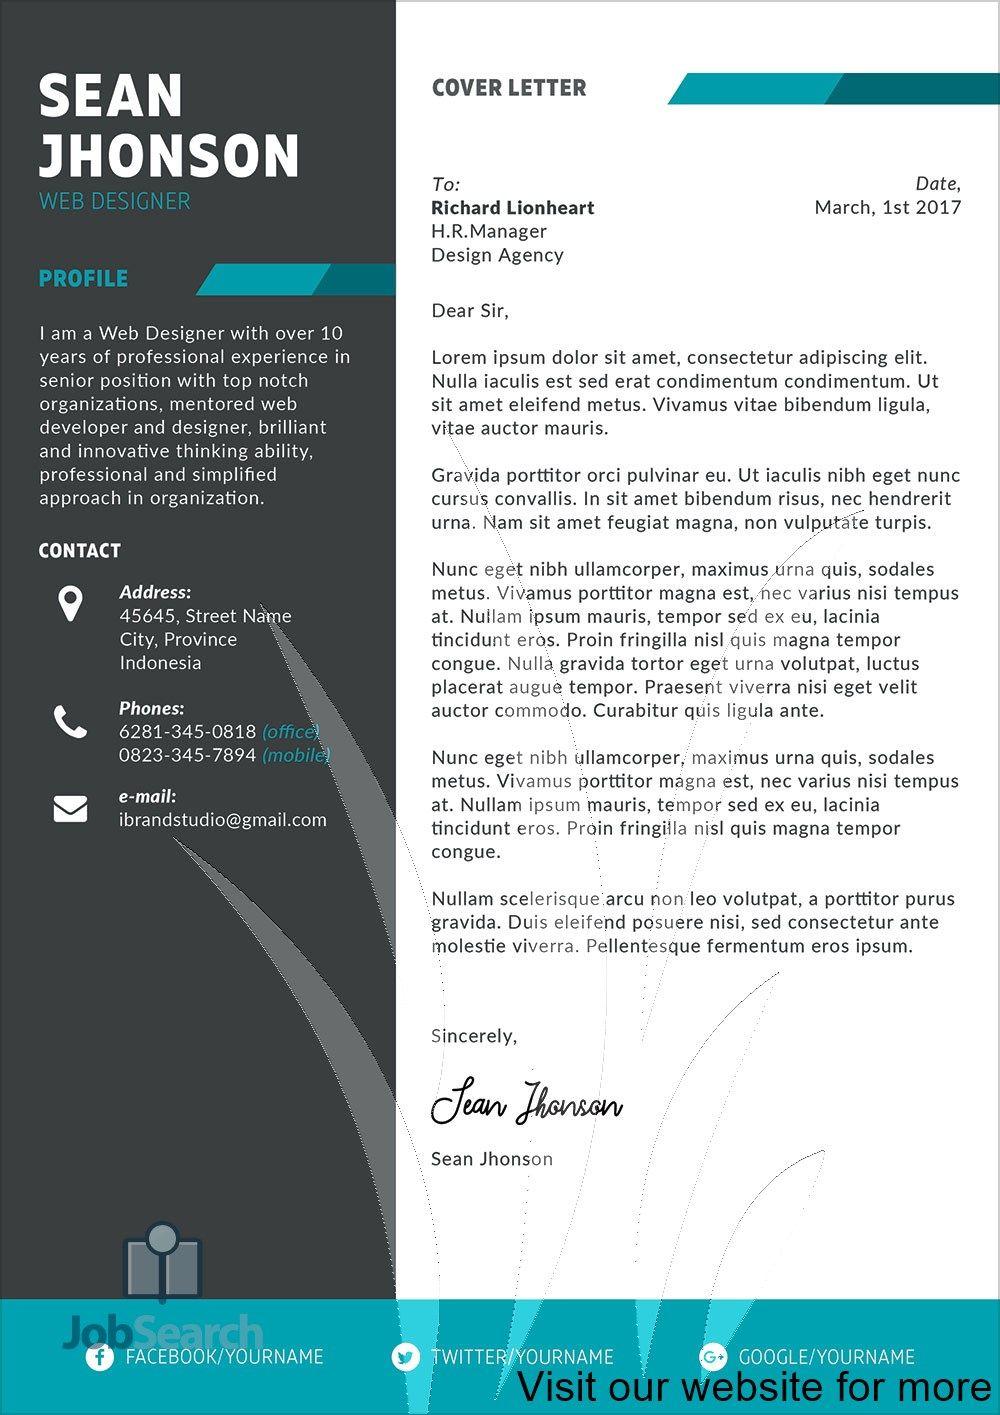 Designer Resume Creative Graphics Resume Design 2020 Cover Letter In 2020 Resume Design Cv Template Free Resume Template